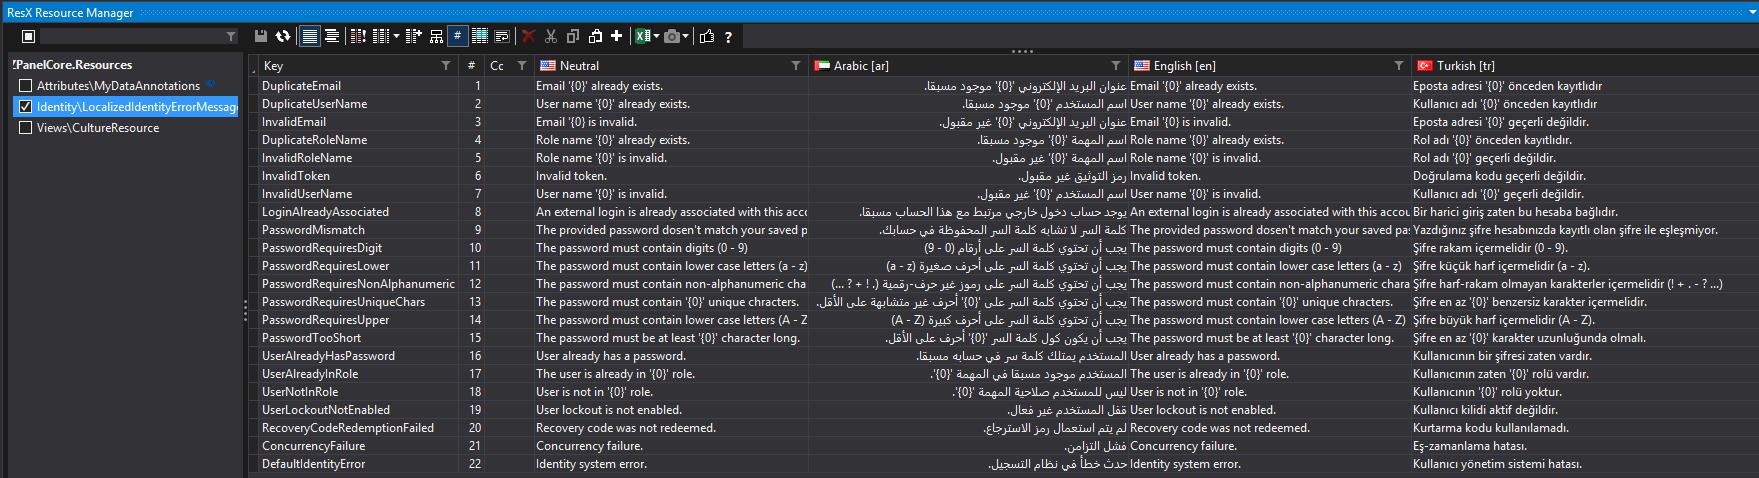 localizing identity error messages